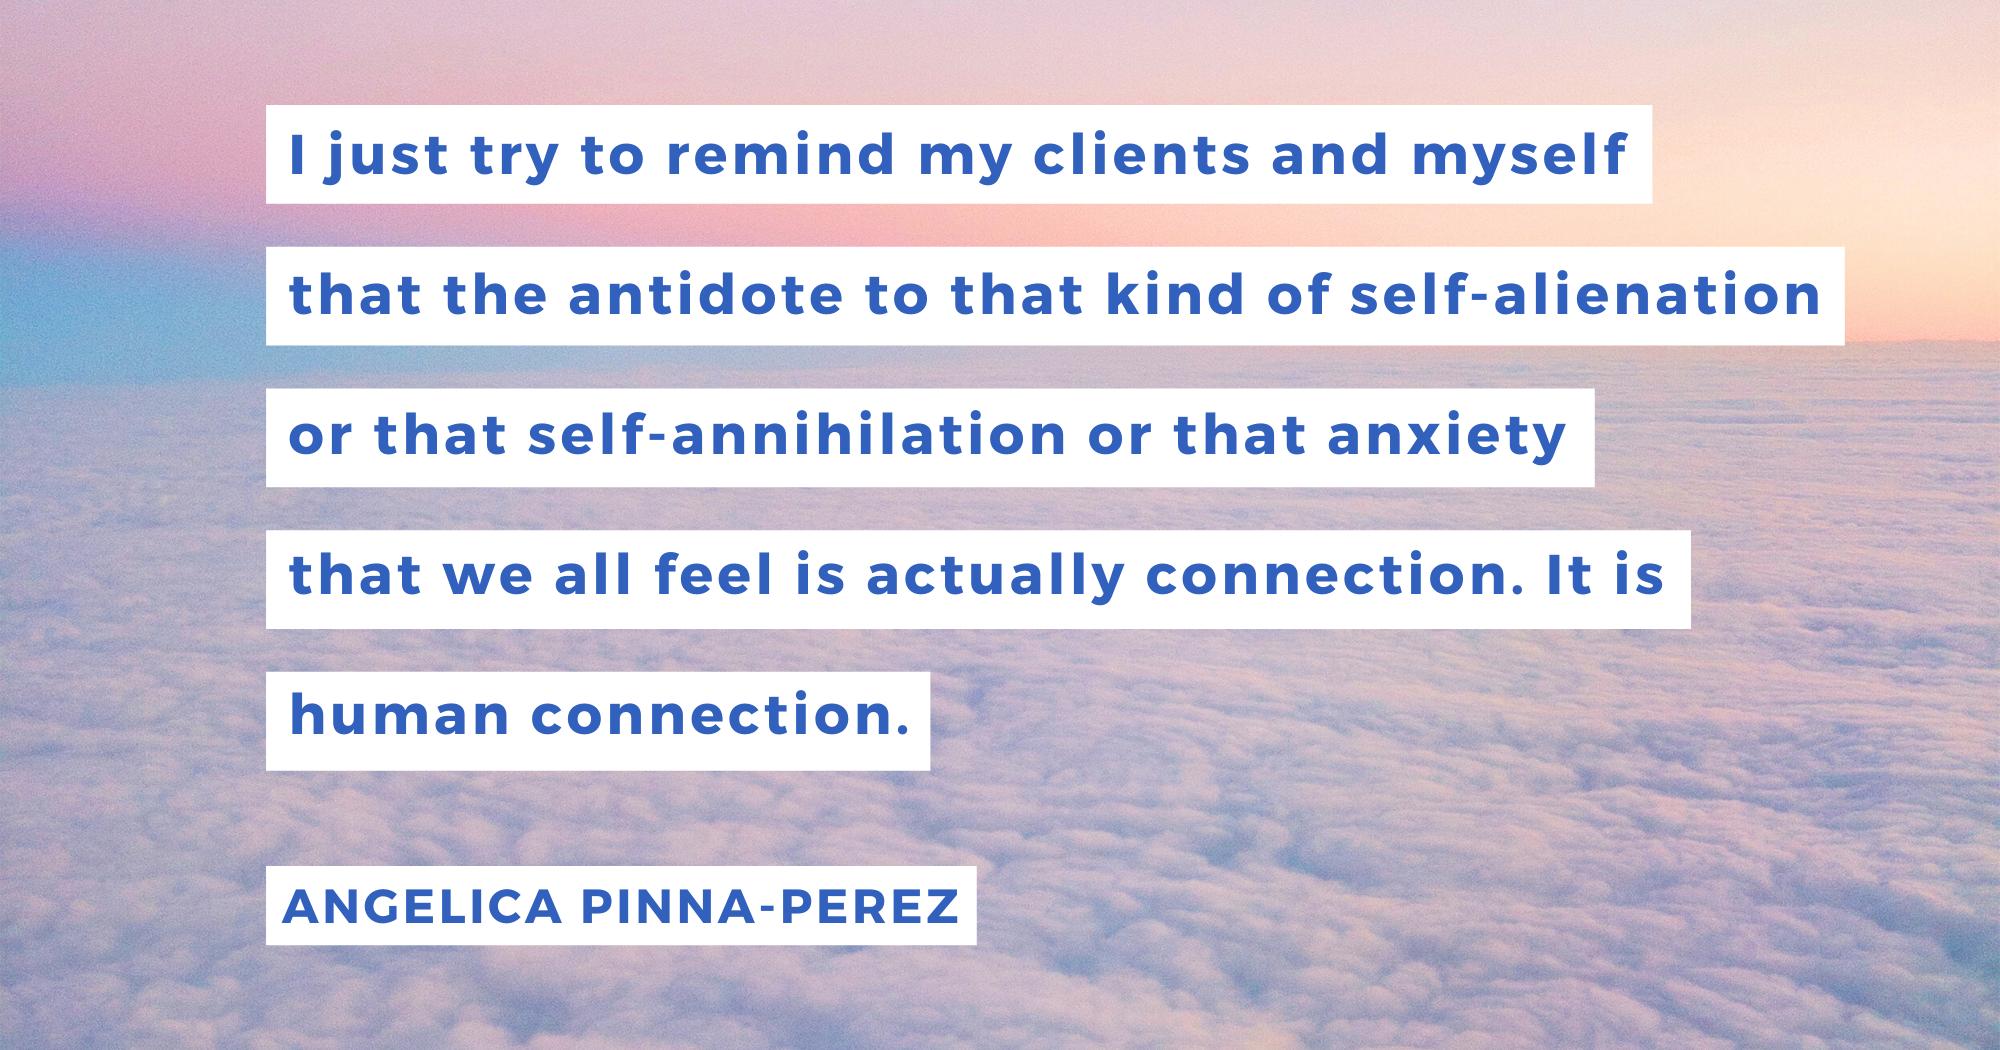 Angelica Pinna-Perez